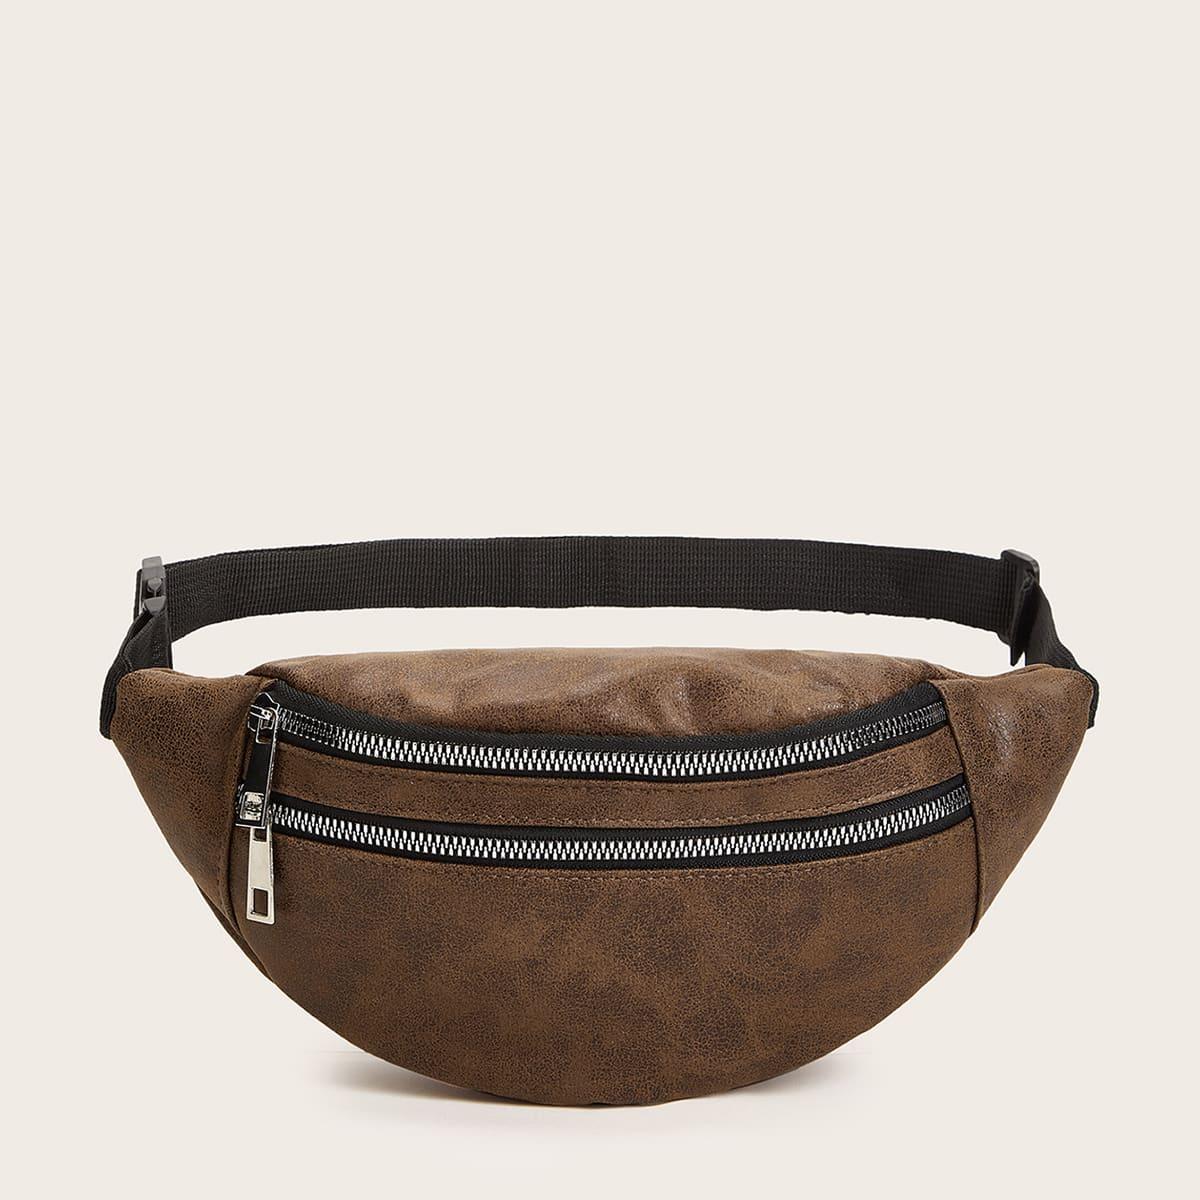 Zipper Front Fanny Pack